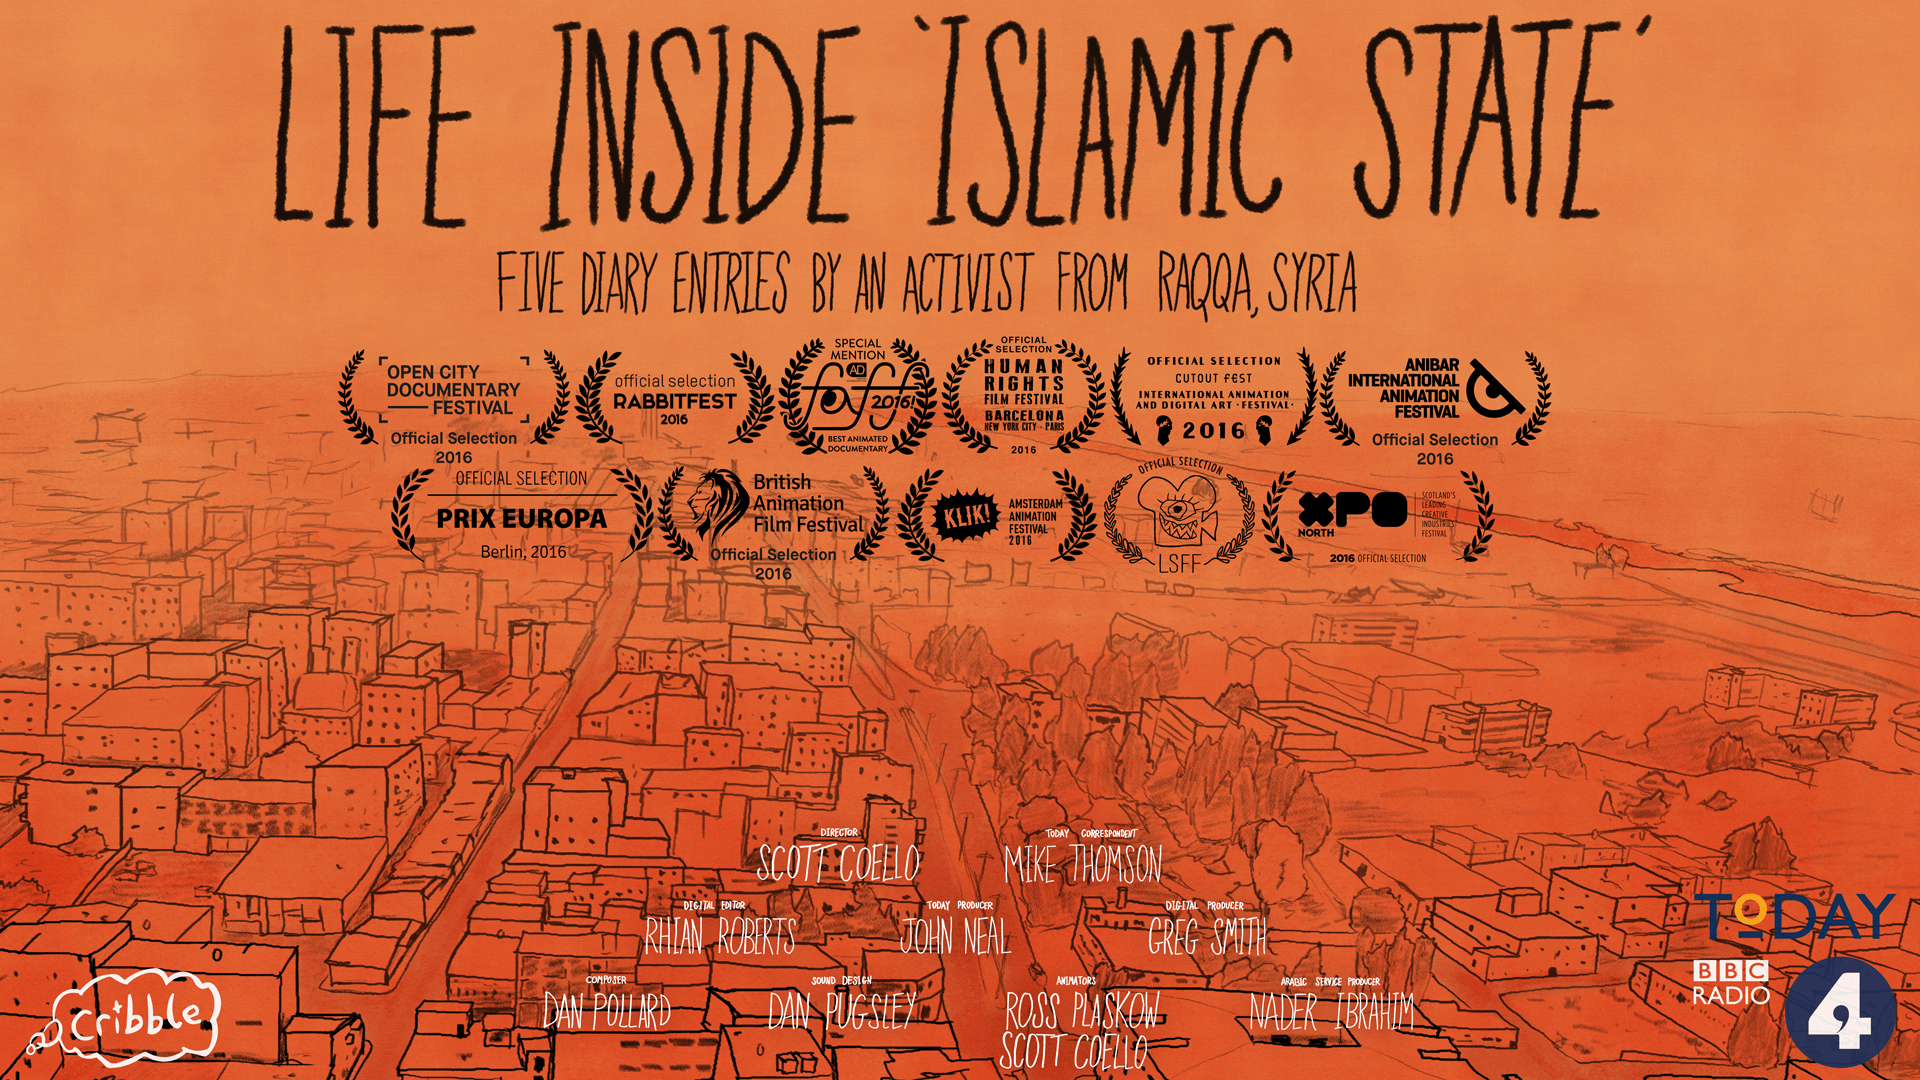 Life Inside Islamic State - BBC Radio 4  Composer